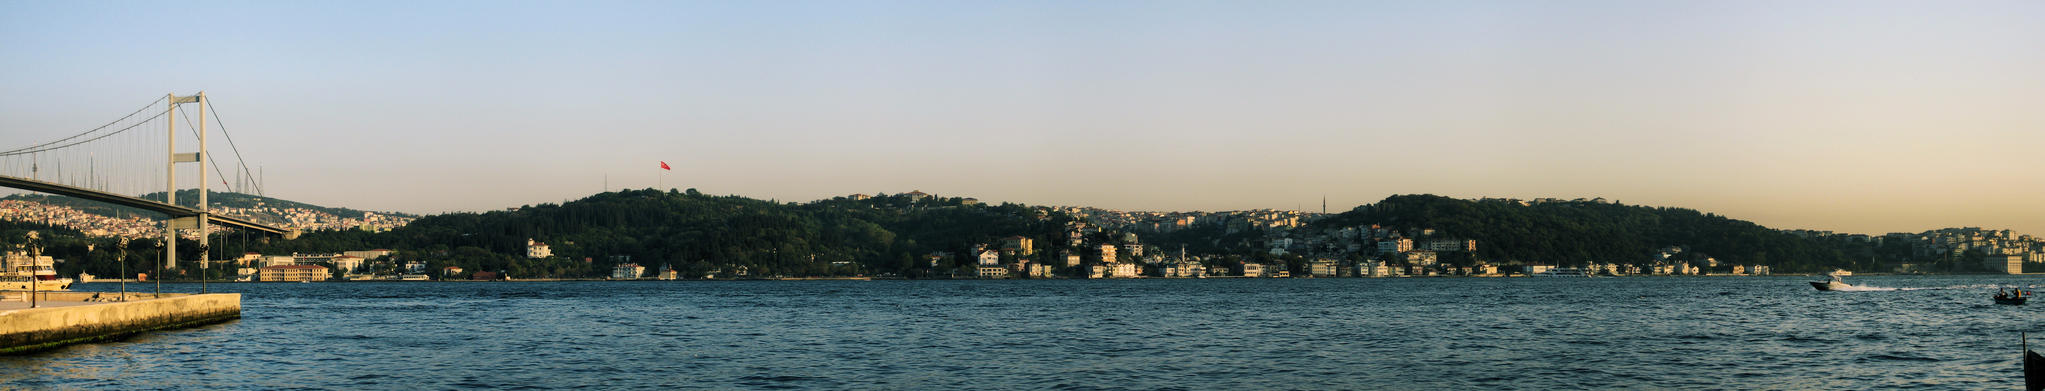 Sunset at Bosphorus by cheyrek